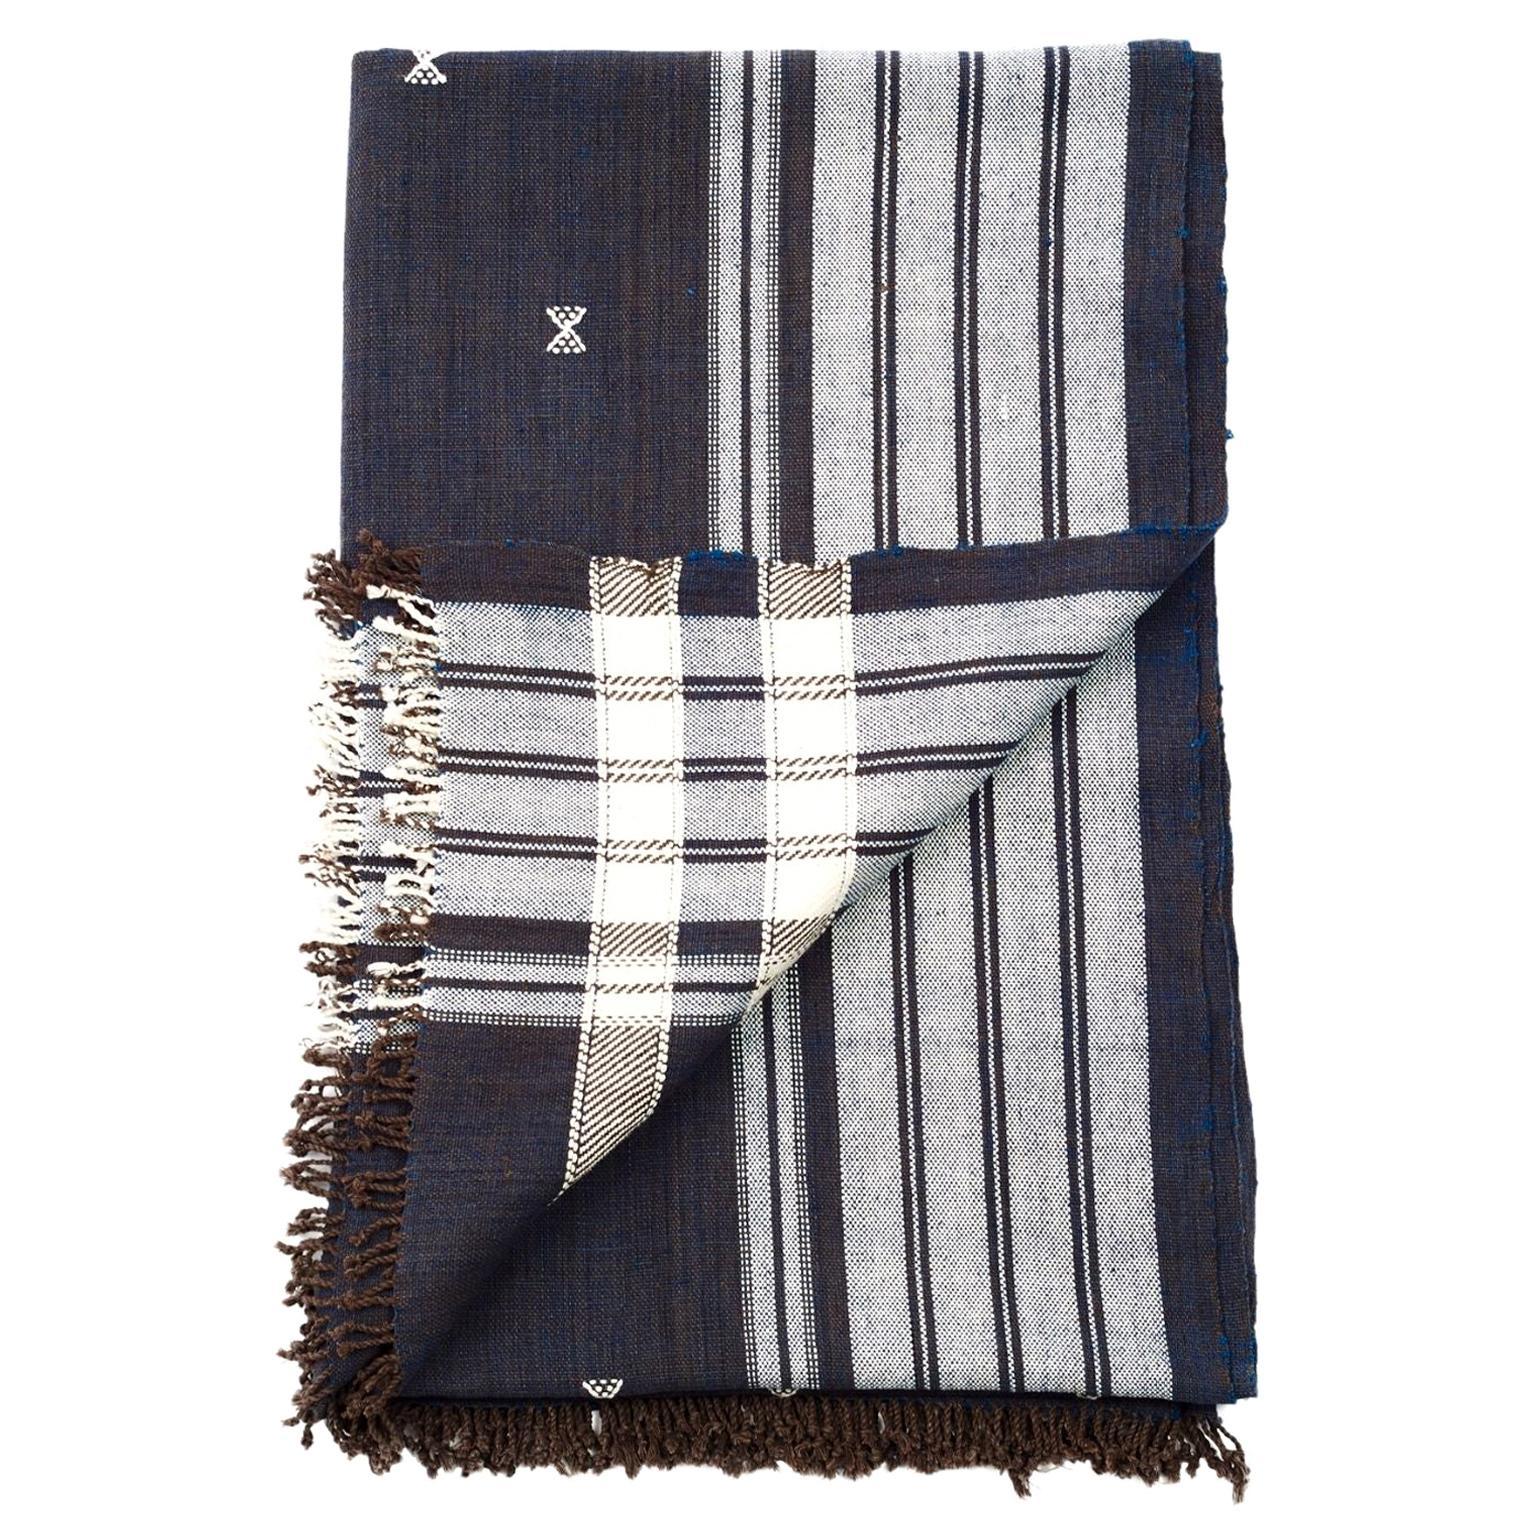 Indie Handloom Throw / Blanket / Bedspread in Indigo Brown Organic Cotton